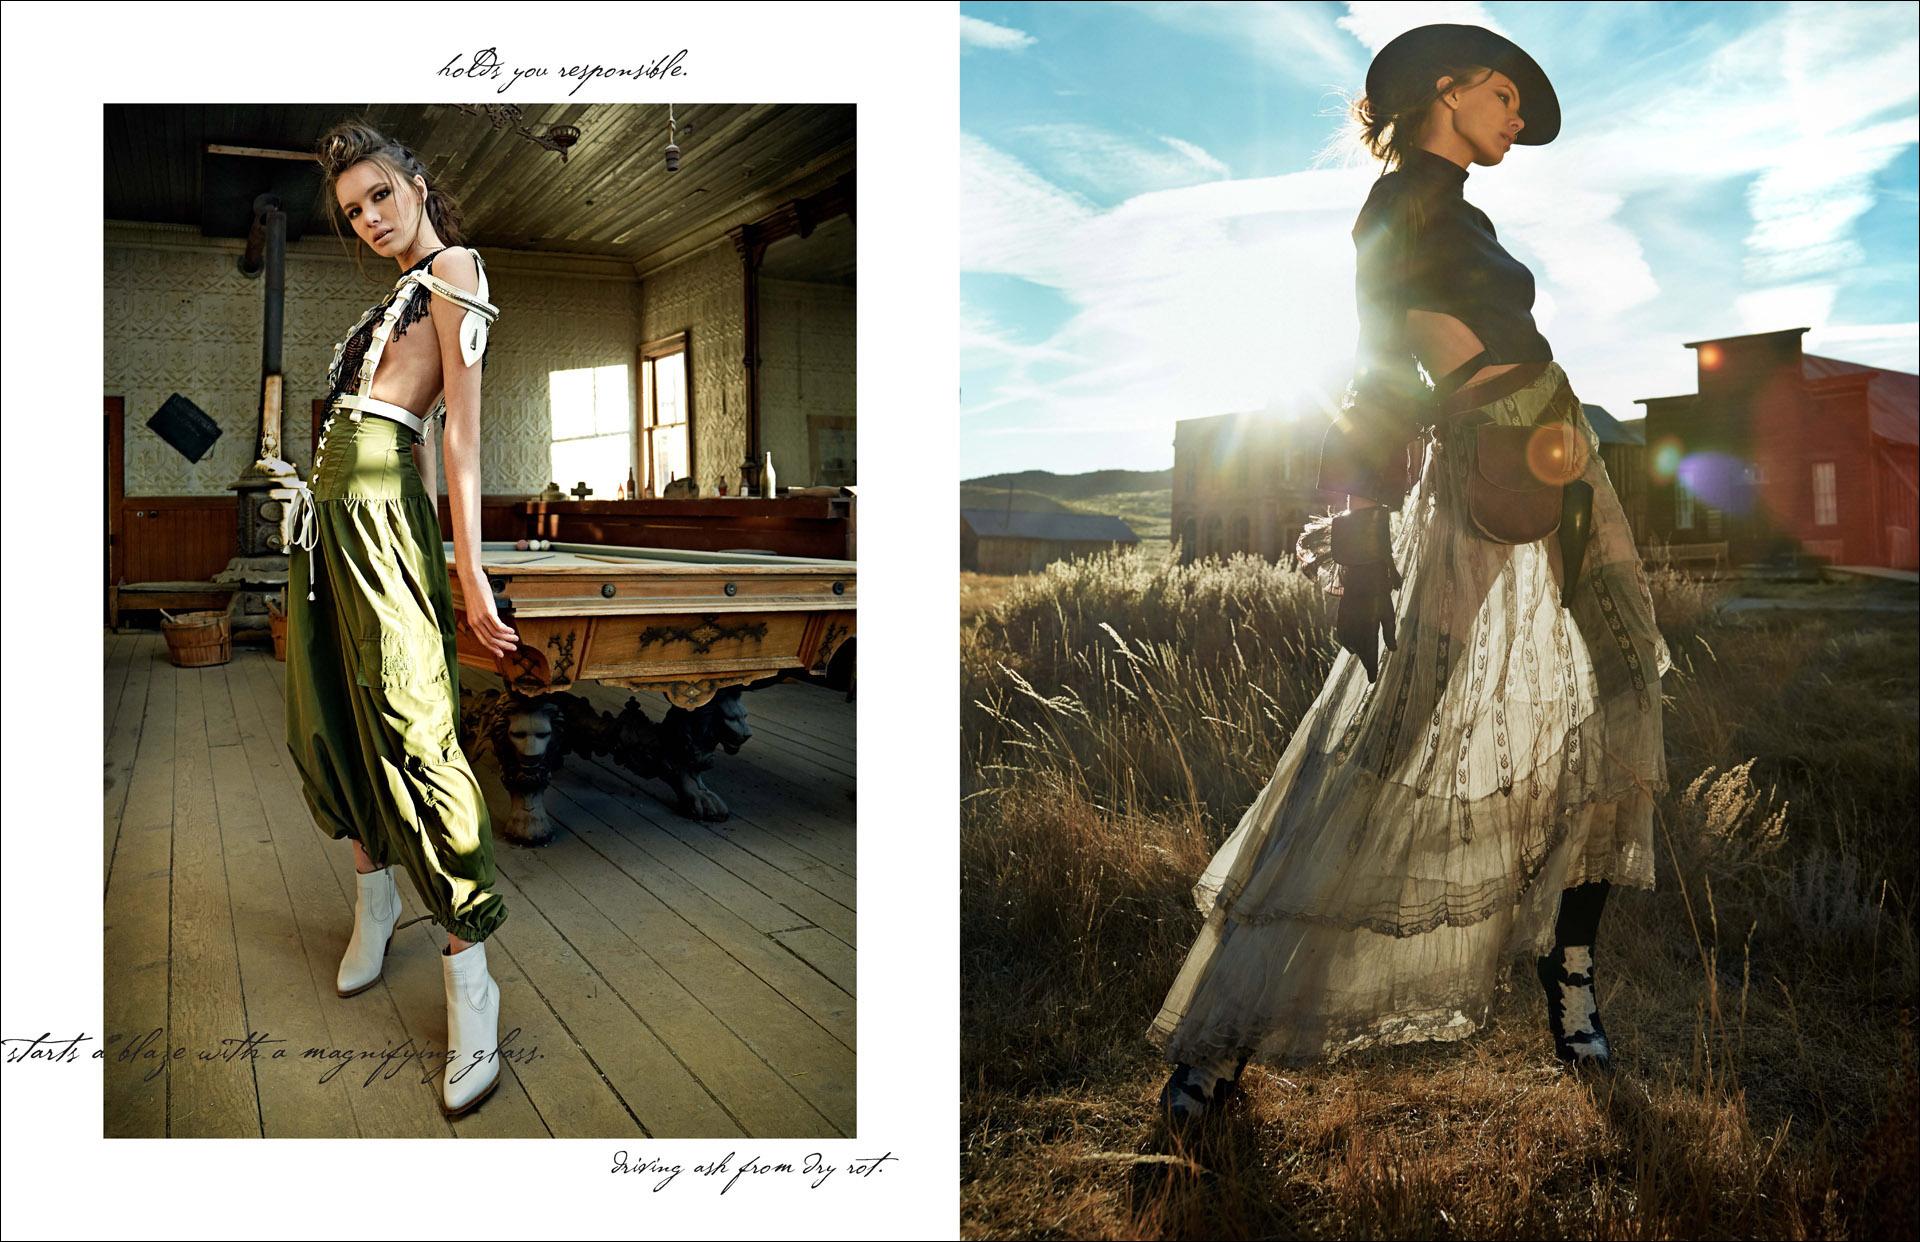 Spirit-&-Flesh-Magazine_LAS-DESPERADAS_by_MEG-WEBSTER_and_ATHANASIA-NICHOLS_006